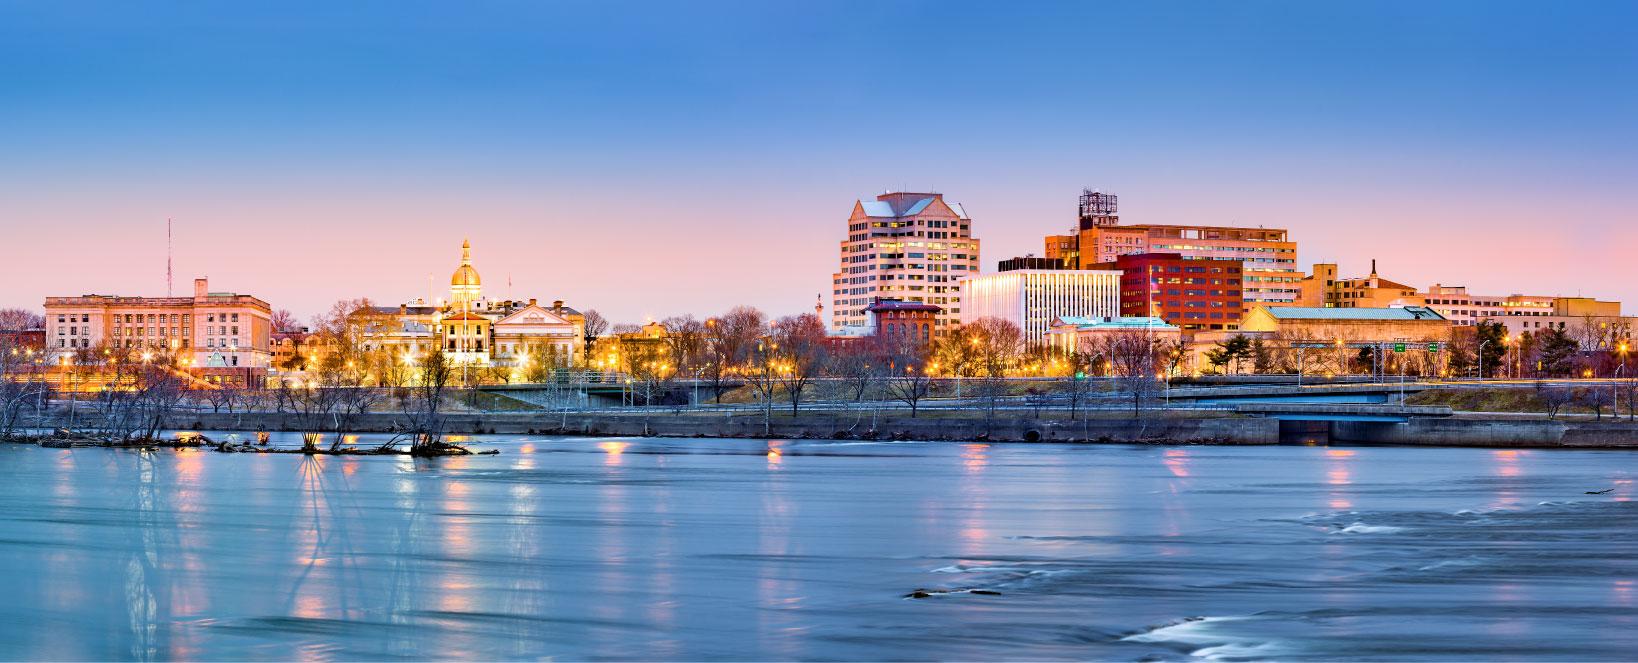 New Jersey's Capital City